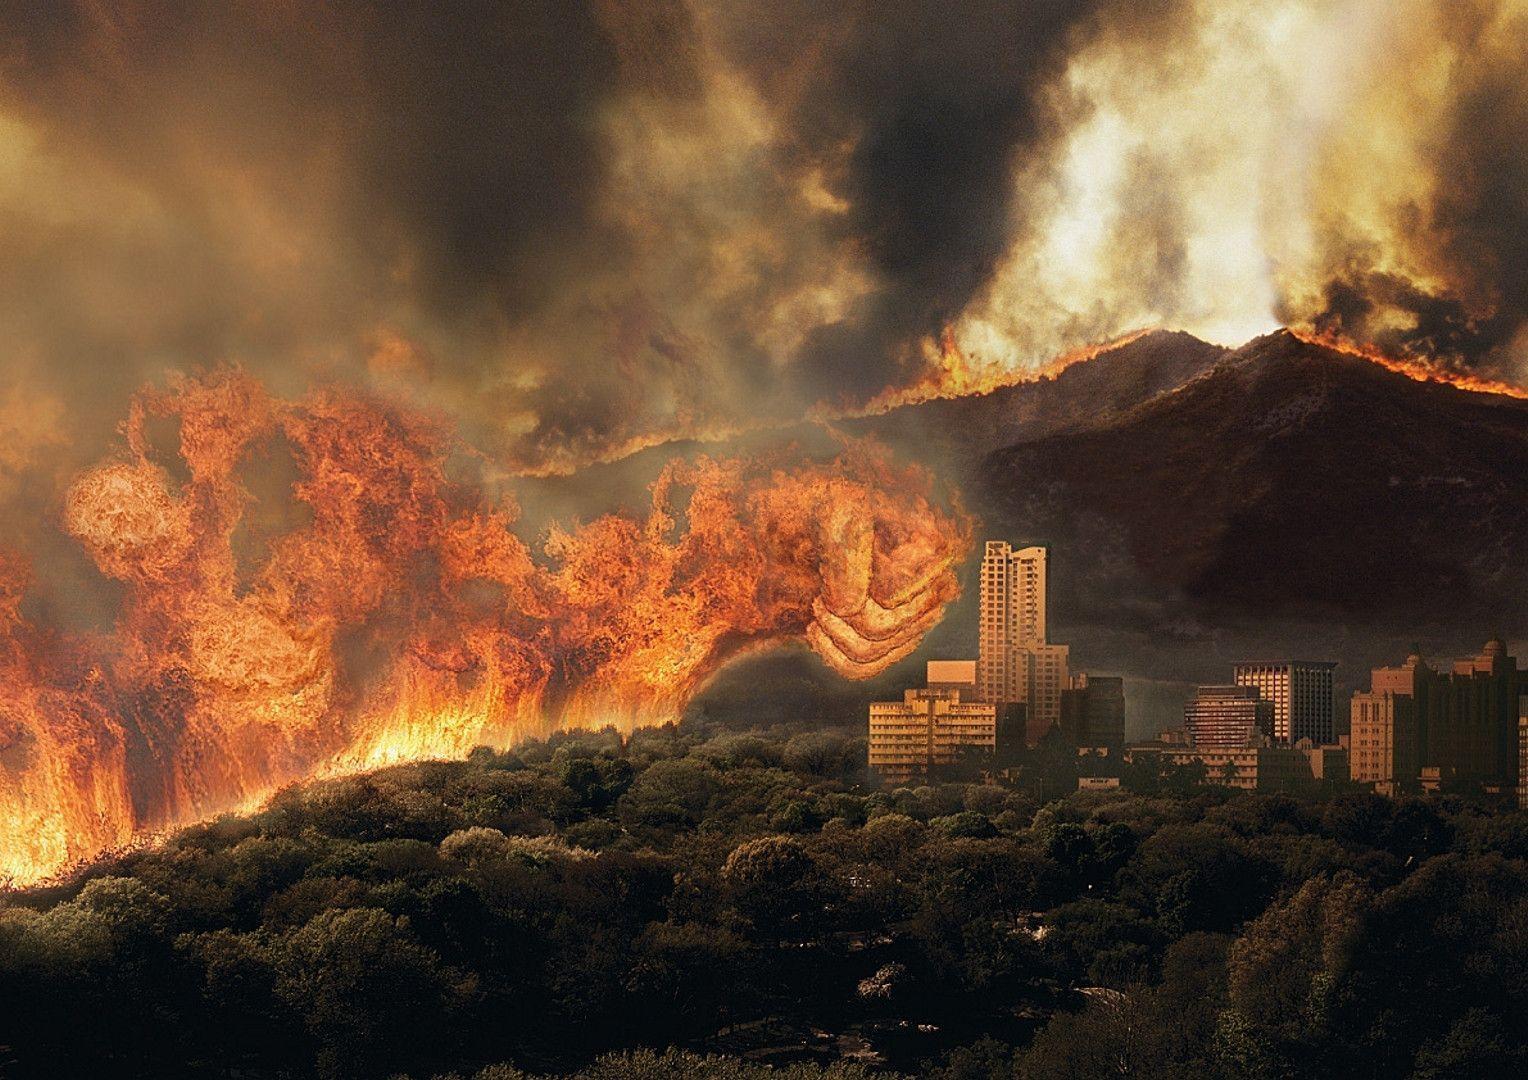 BNPB Forest Fires